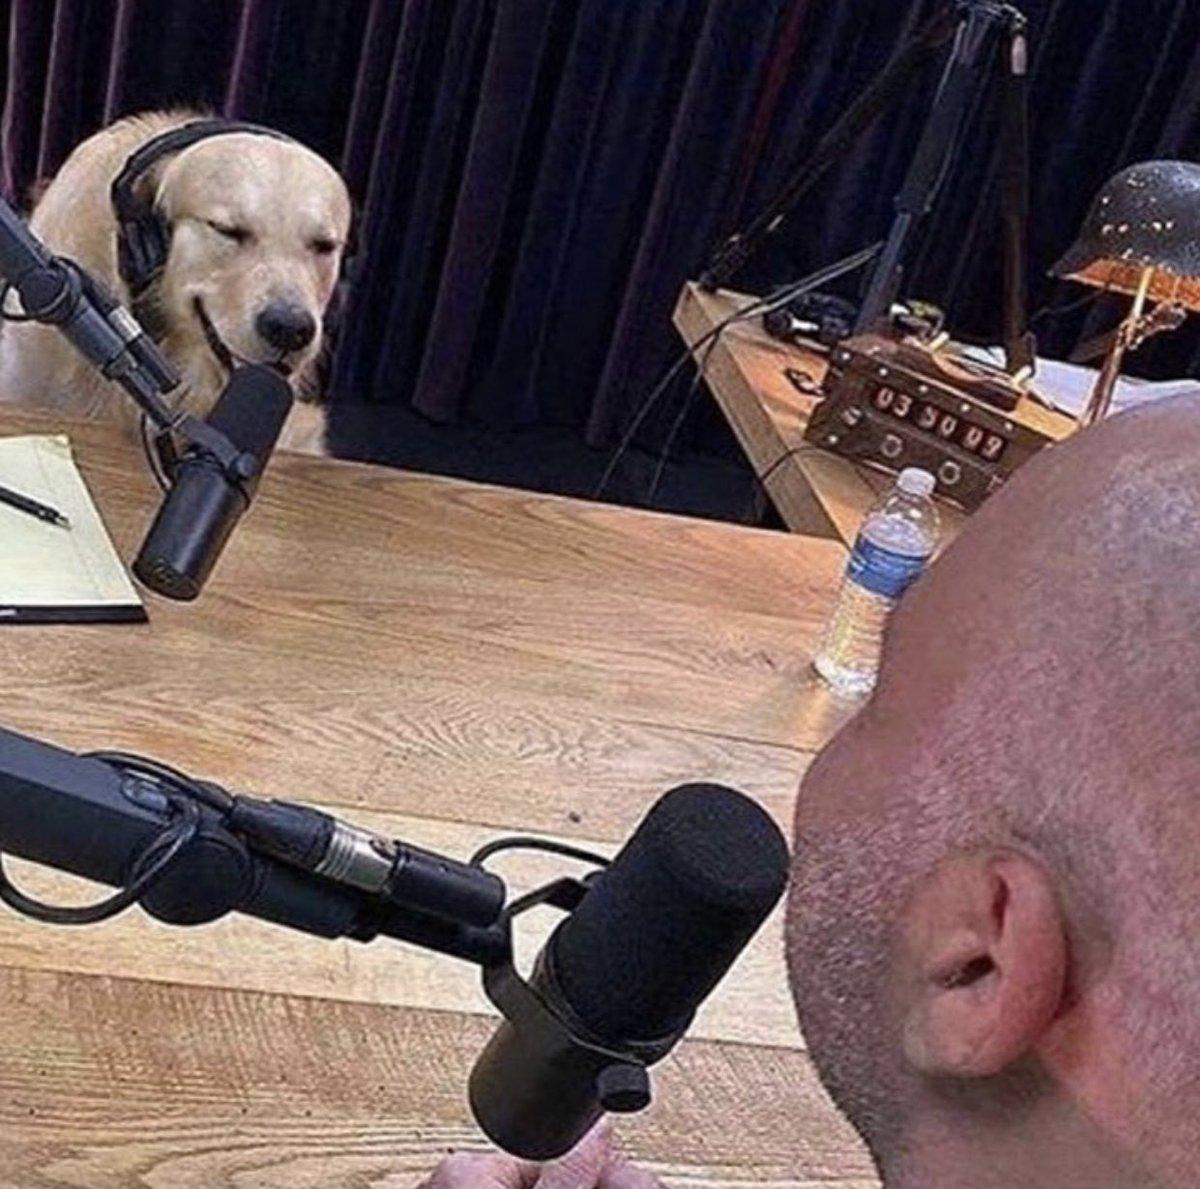 """yeah it's true I ate his homework so what"" https://t.co/8IpuQmVrfF"